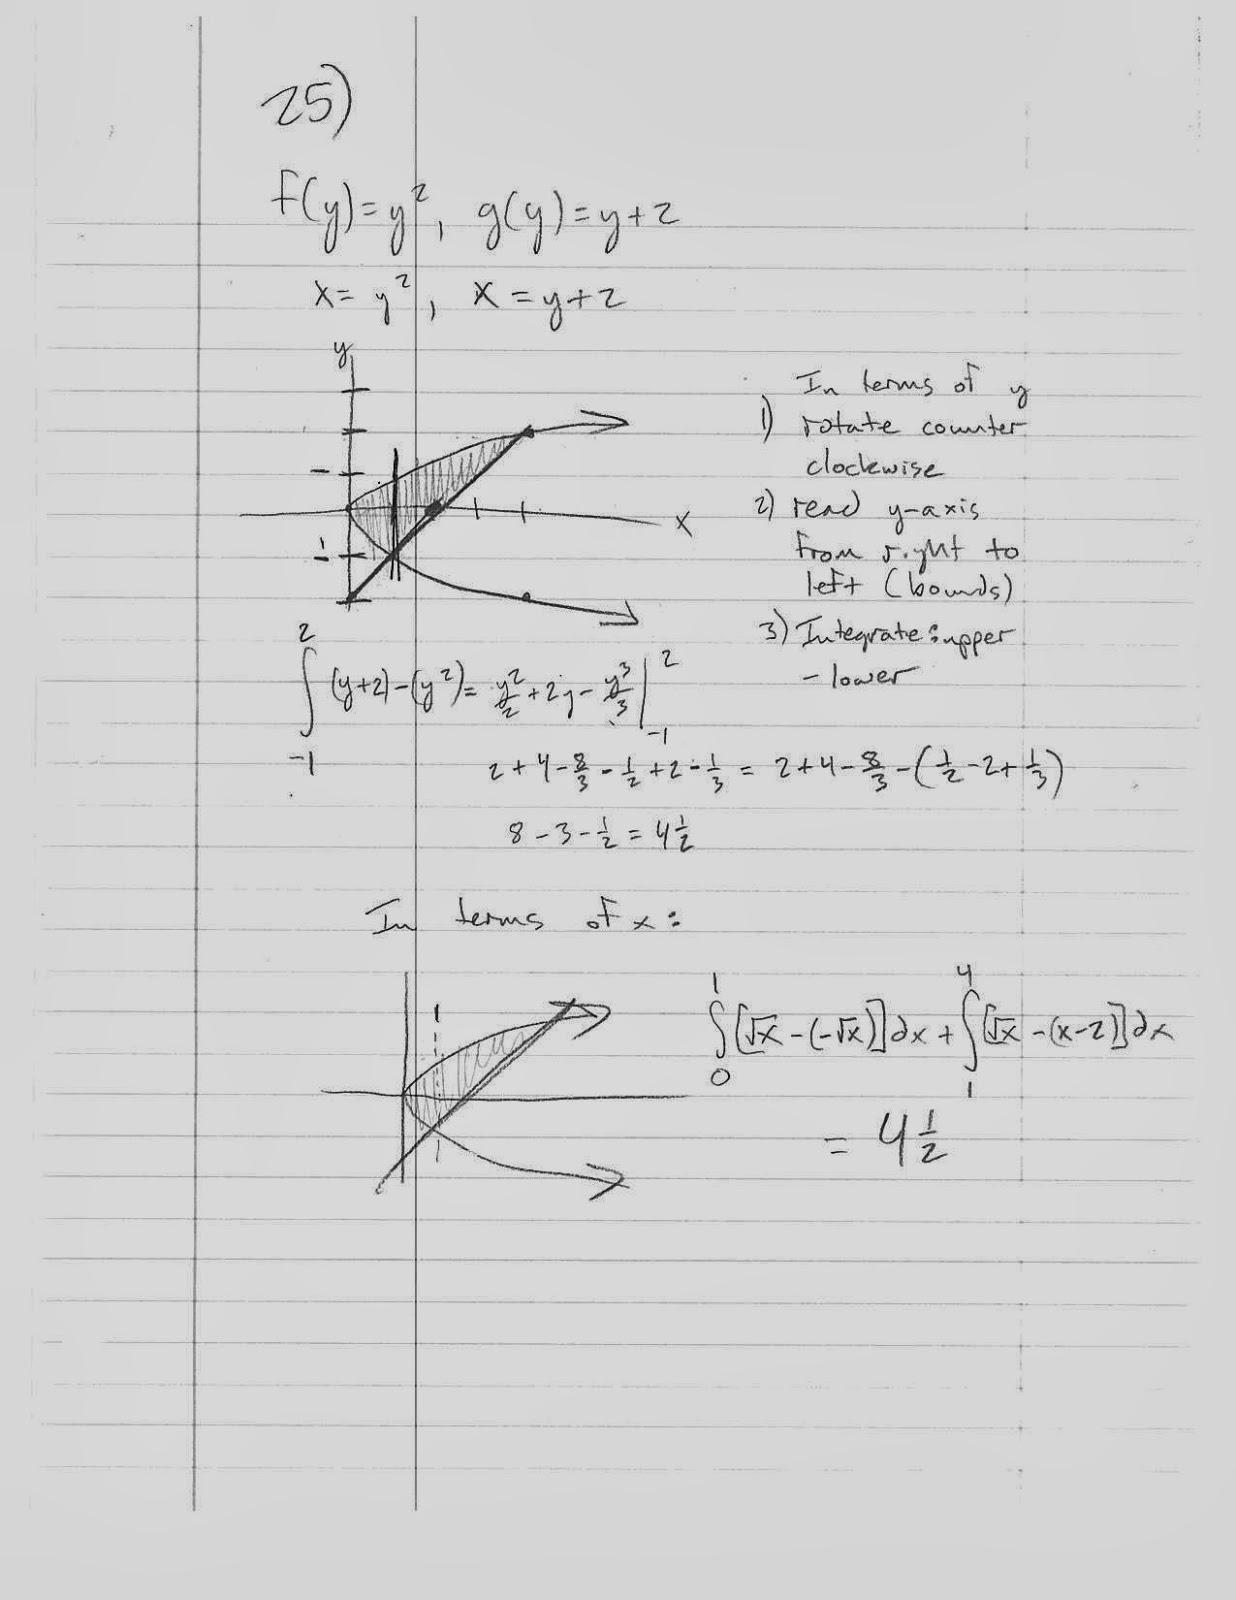 Ap calculus homework assignments